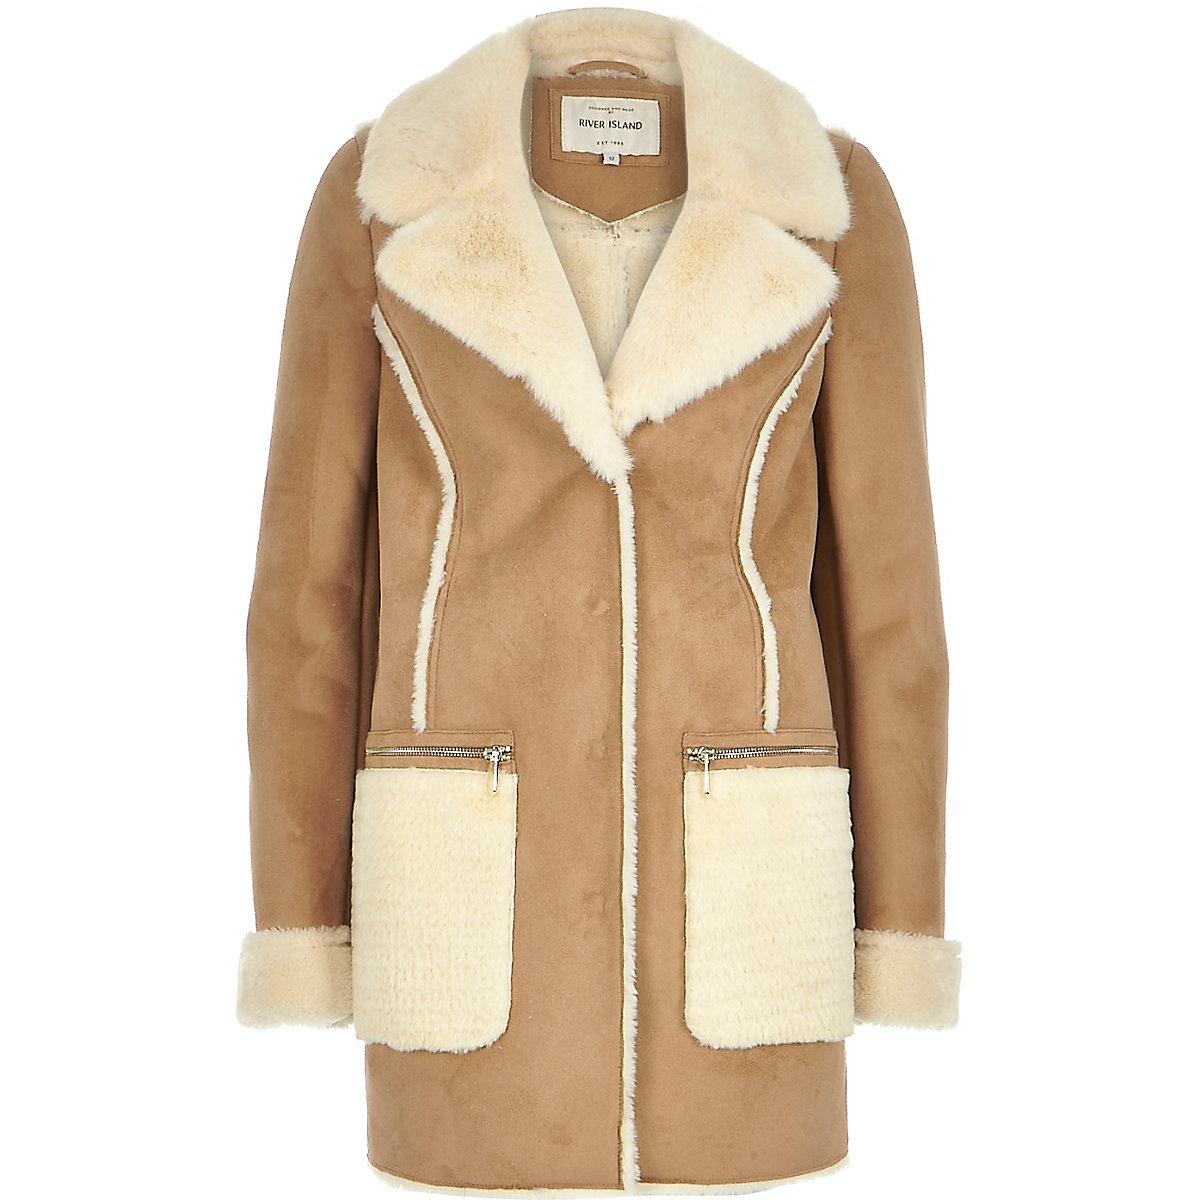 Camel brown faux-suede winter coat